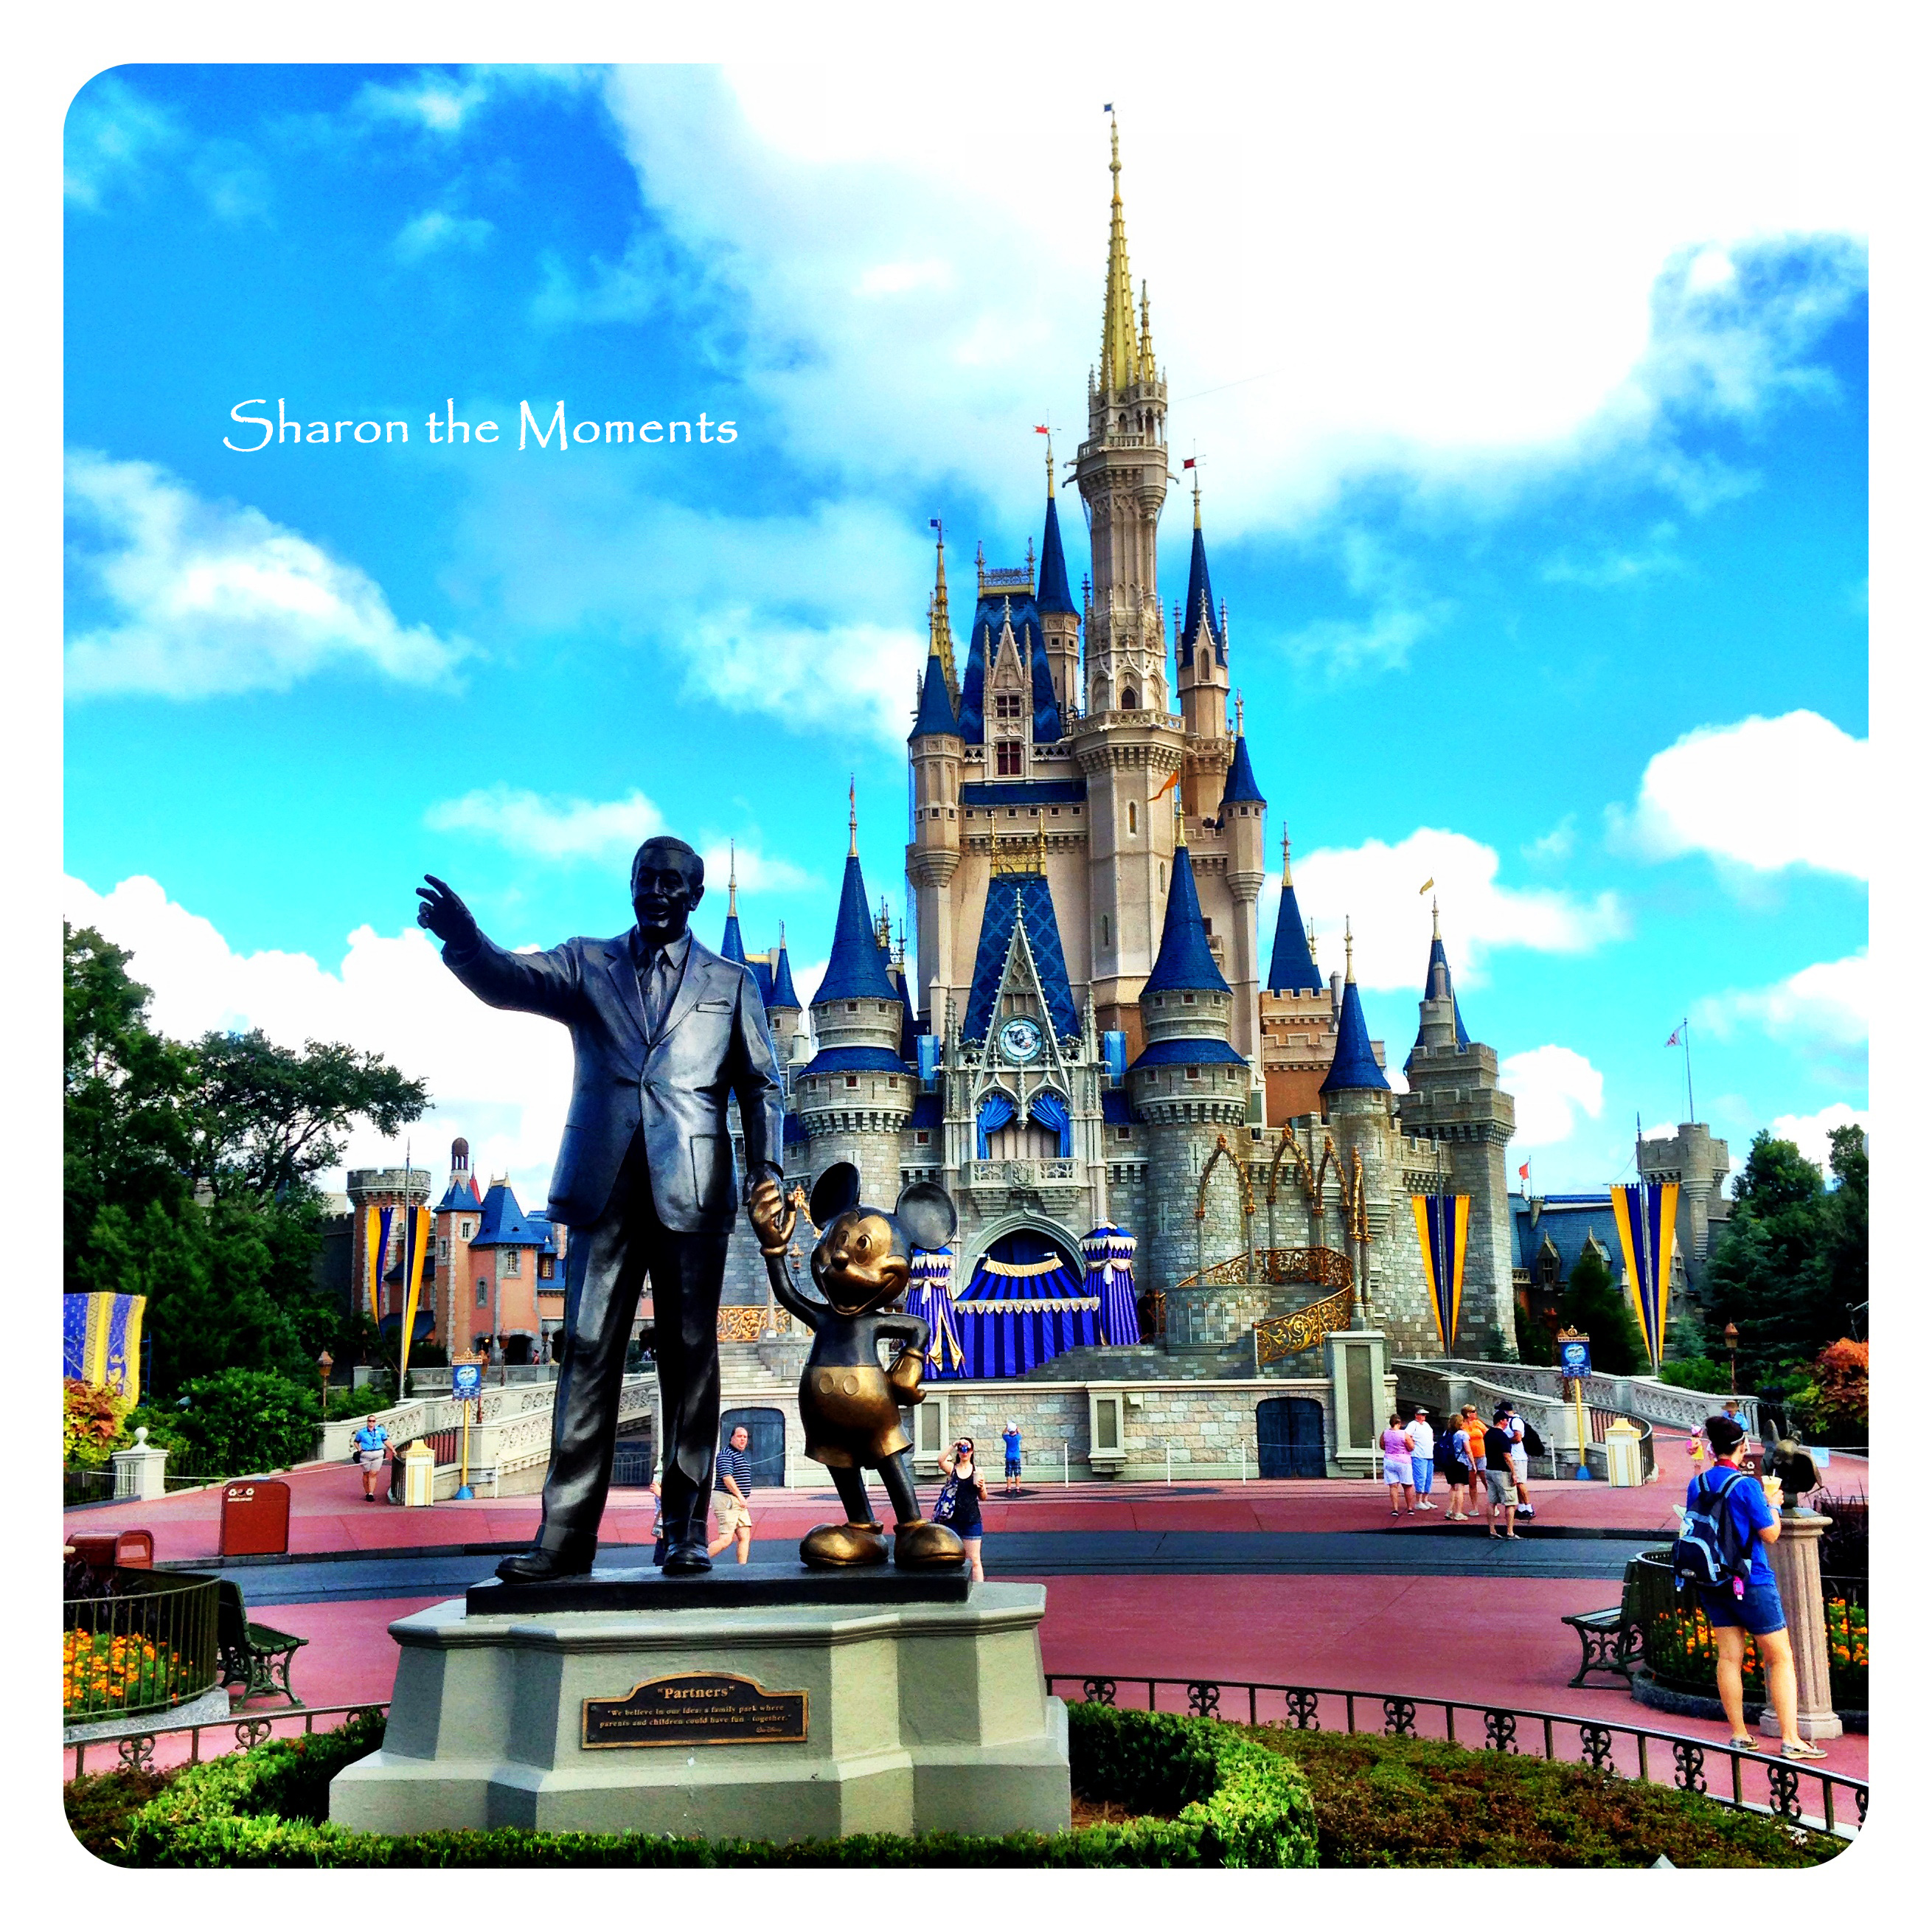 Walt Disney World Magic Kingdom|Sharon the Moments Blog